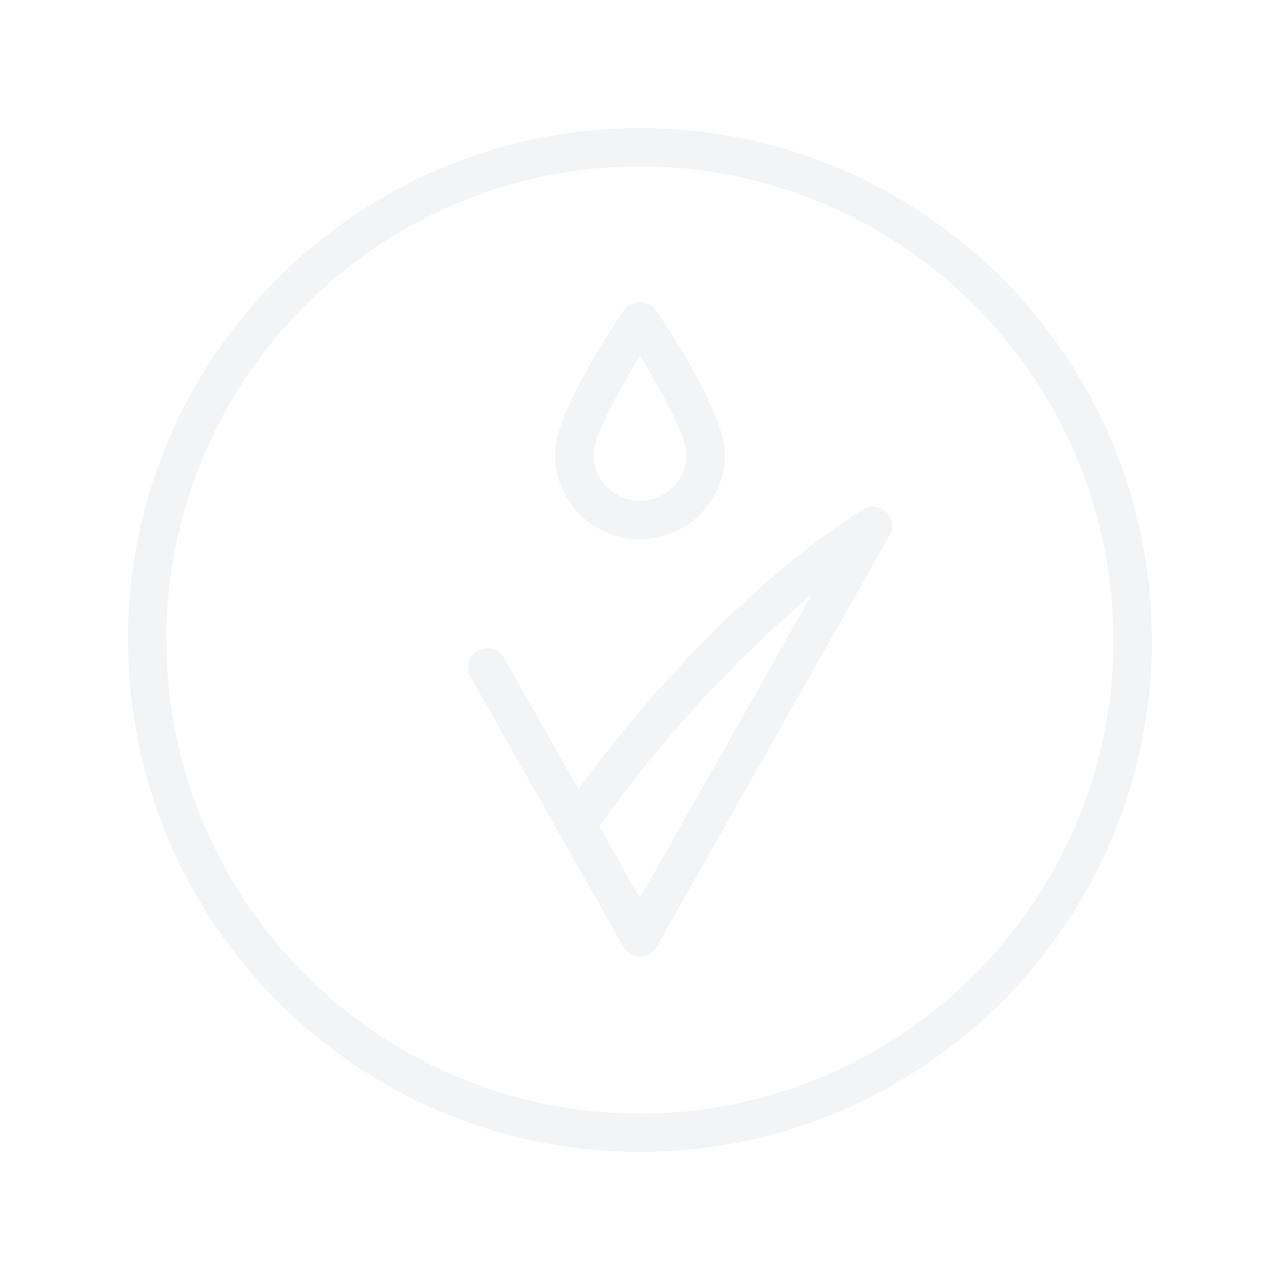 ARTDECO Hydra Make-Up Mousse 20ml